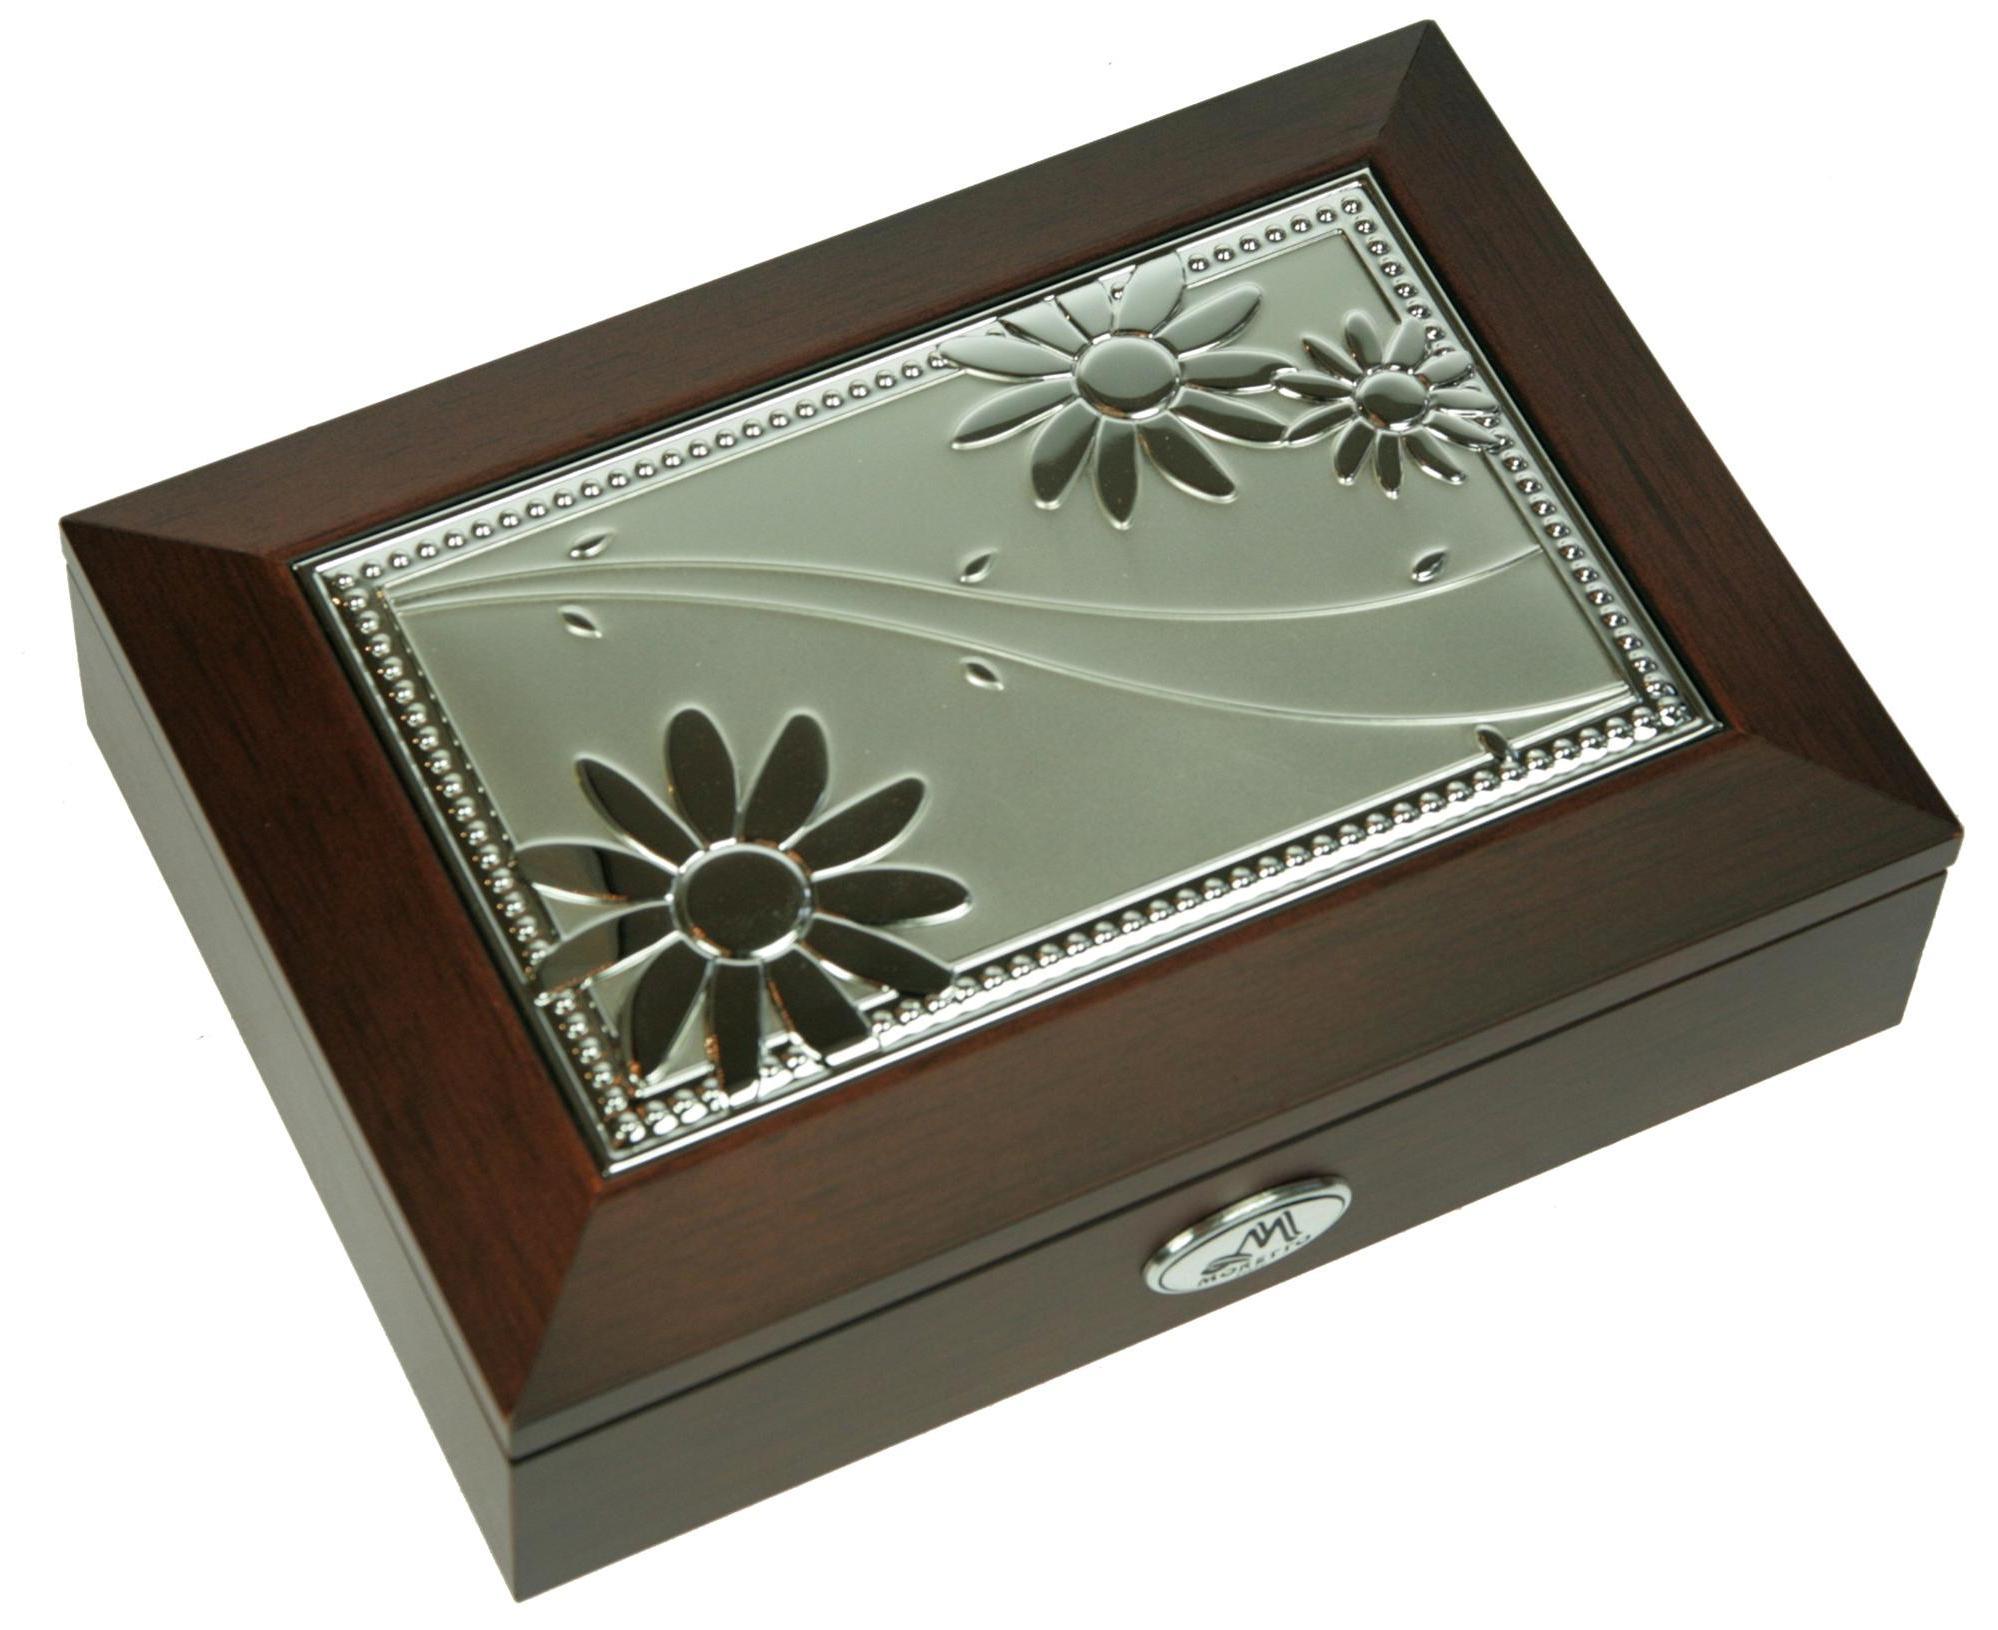 Шкатулка для ювелирных украшений Moretto, 18 х 13 х 5 см. 39849 шкатулка для ювелирных украшений moretto 18 х 13 х 5 см 139522